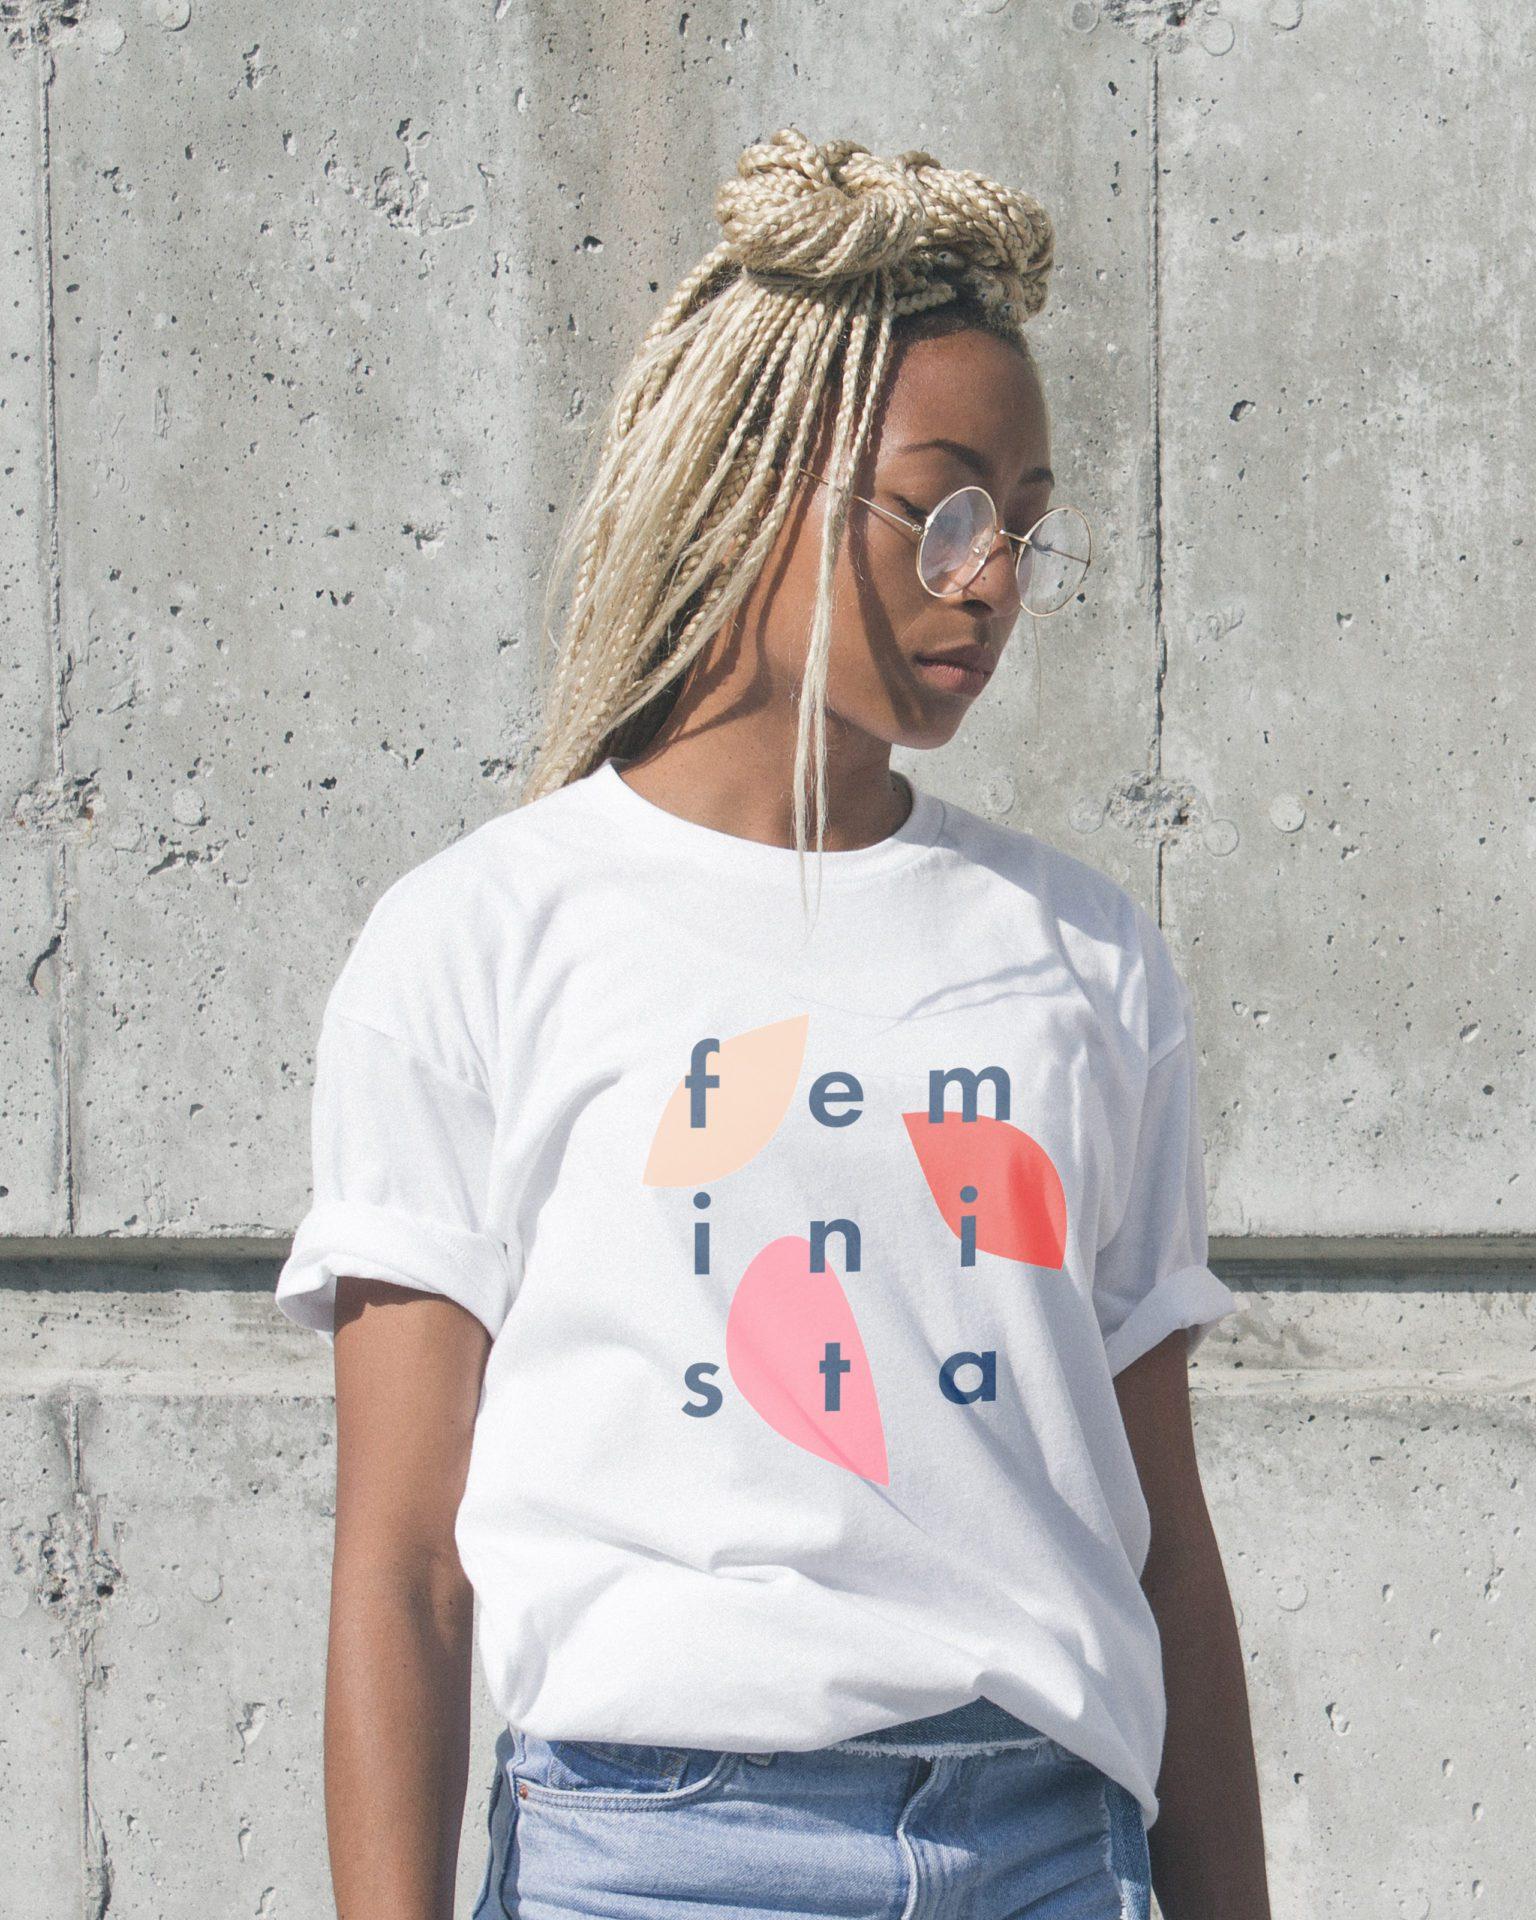 T-Shirt Design Trends for 2018 - Around the Bonfire